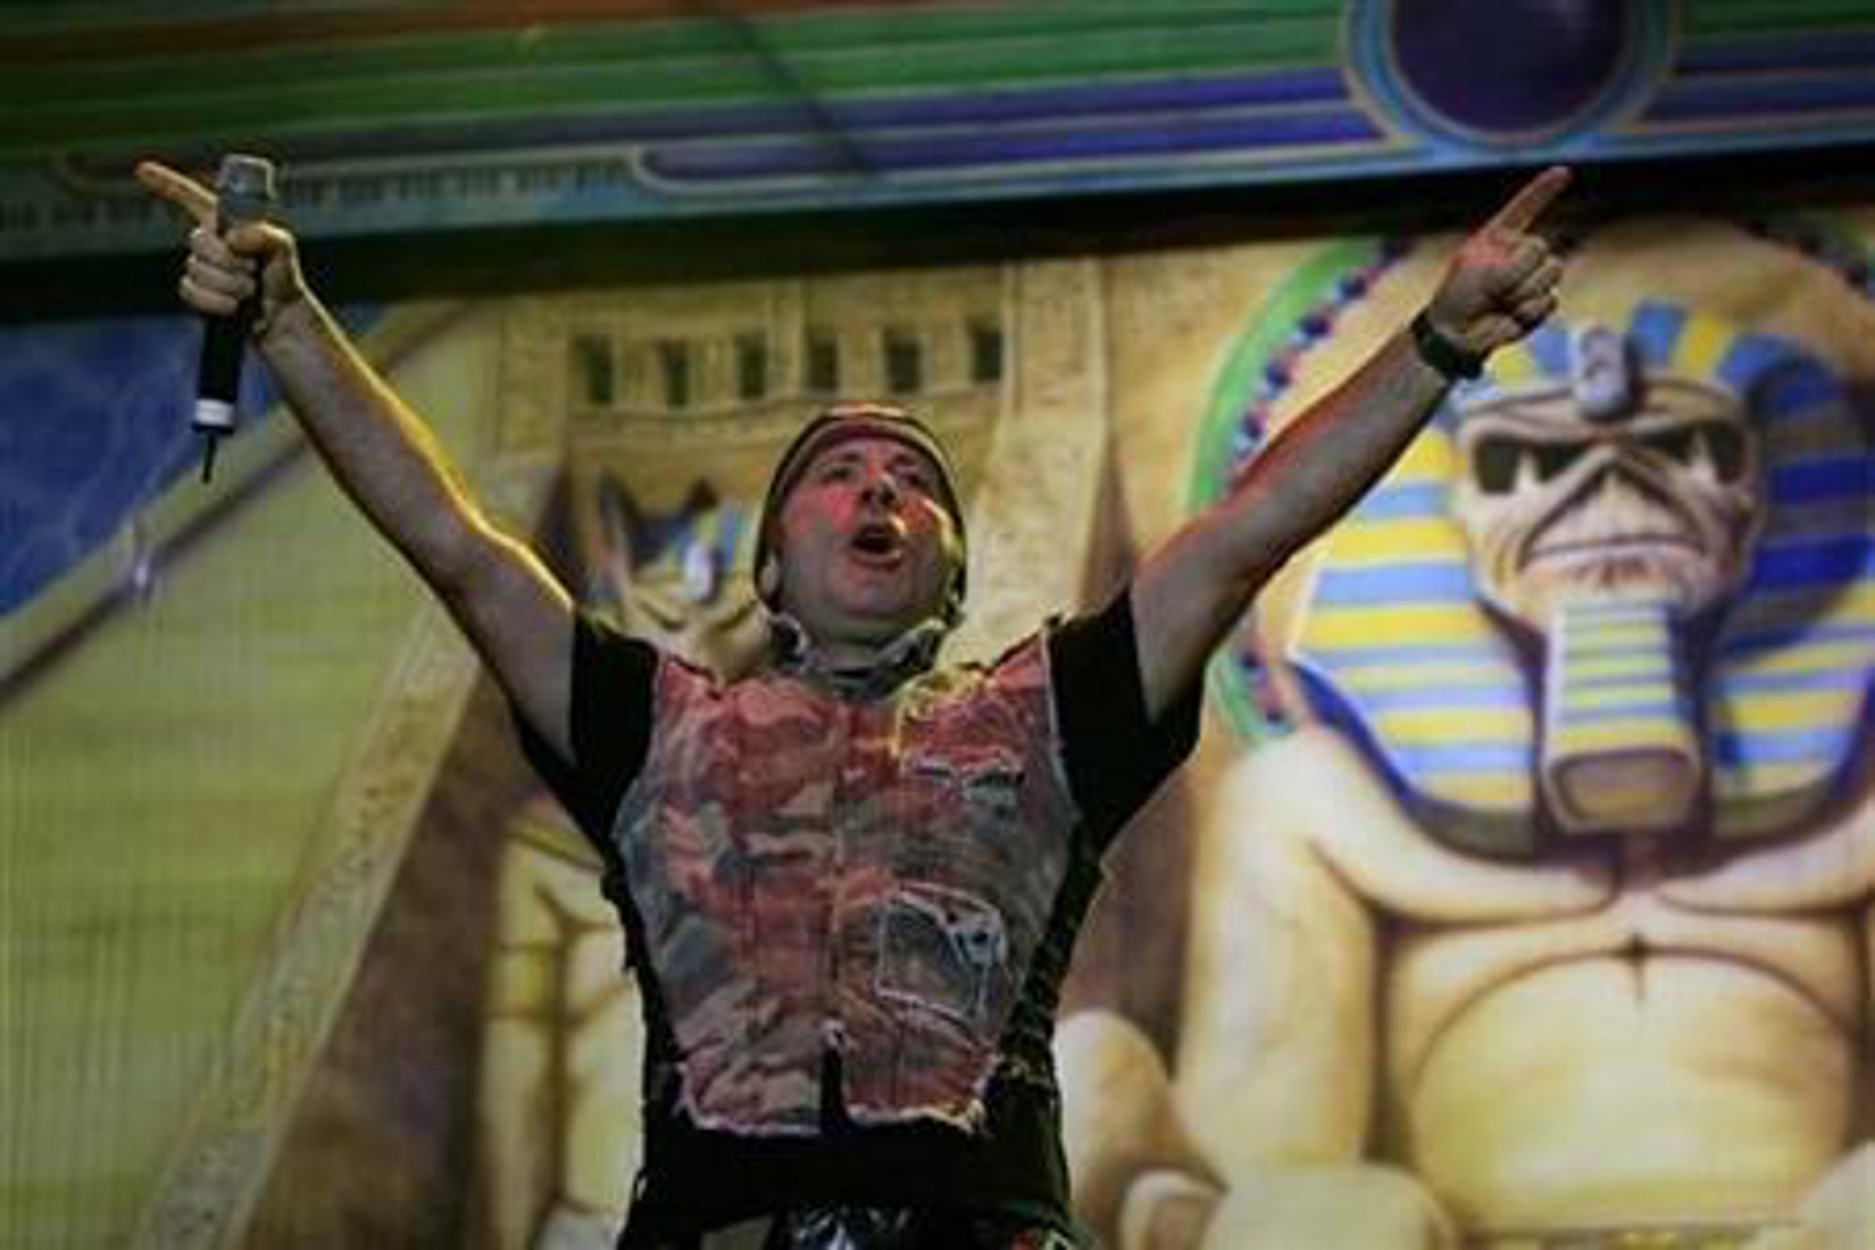 Iron Maiden: Ο Μπρους Ντίκινσον ανάρρωσε από τον κορονοϊό και προτρέπει όλους να εμβολιαστούν